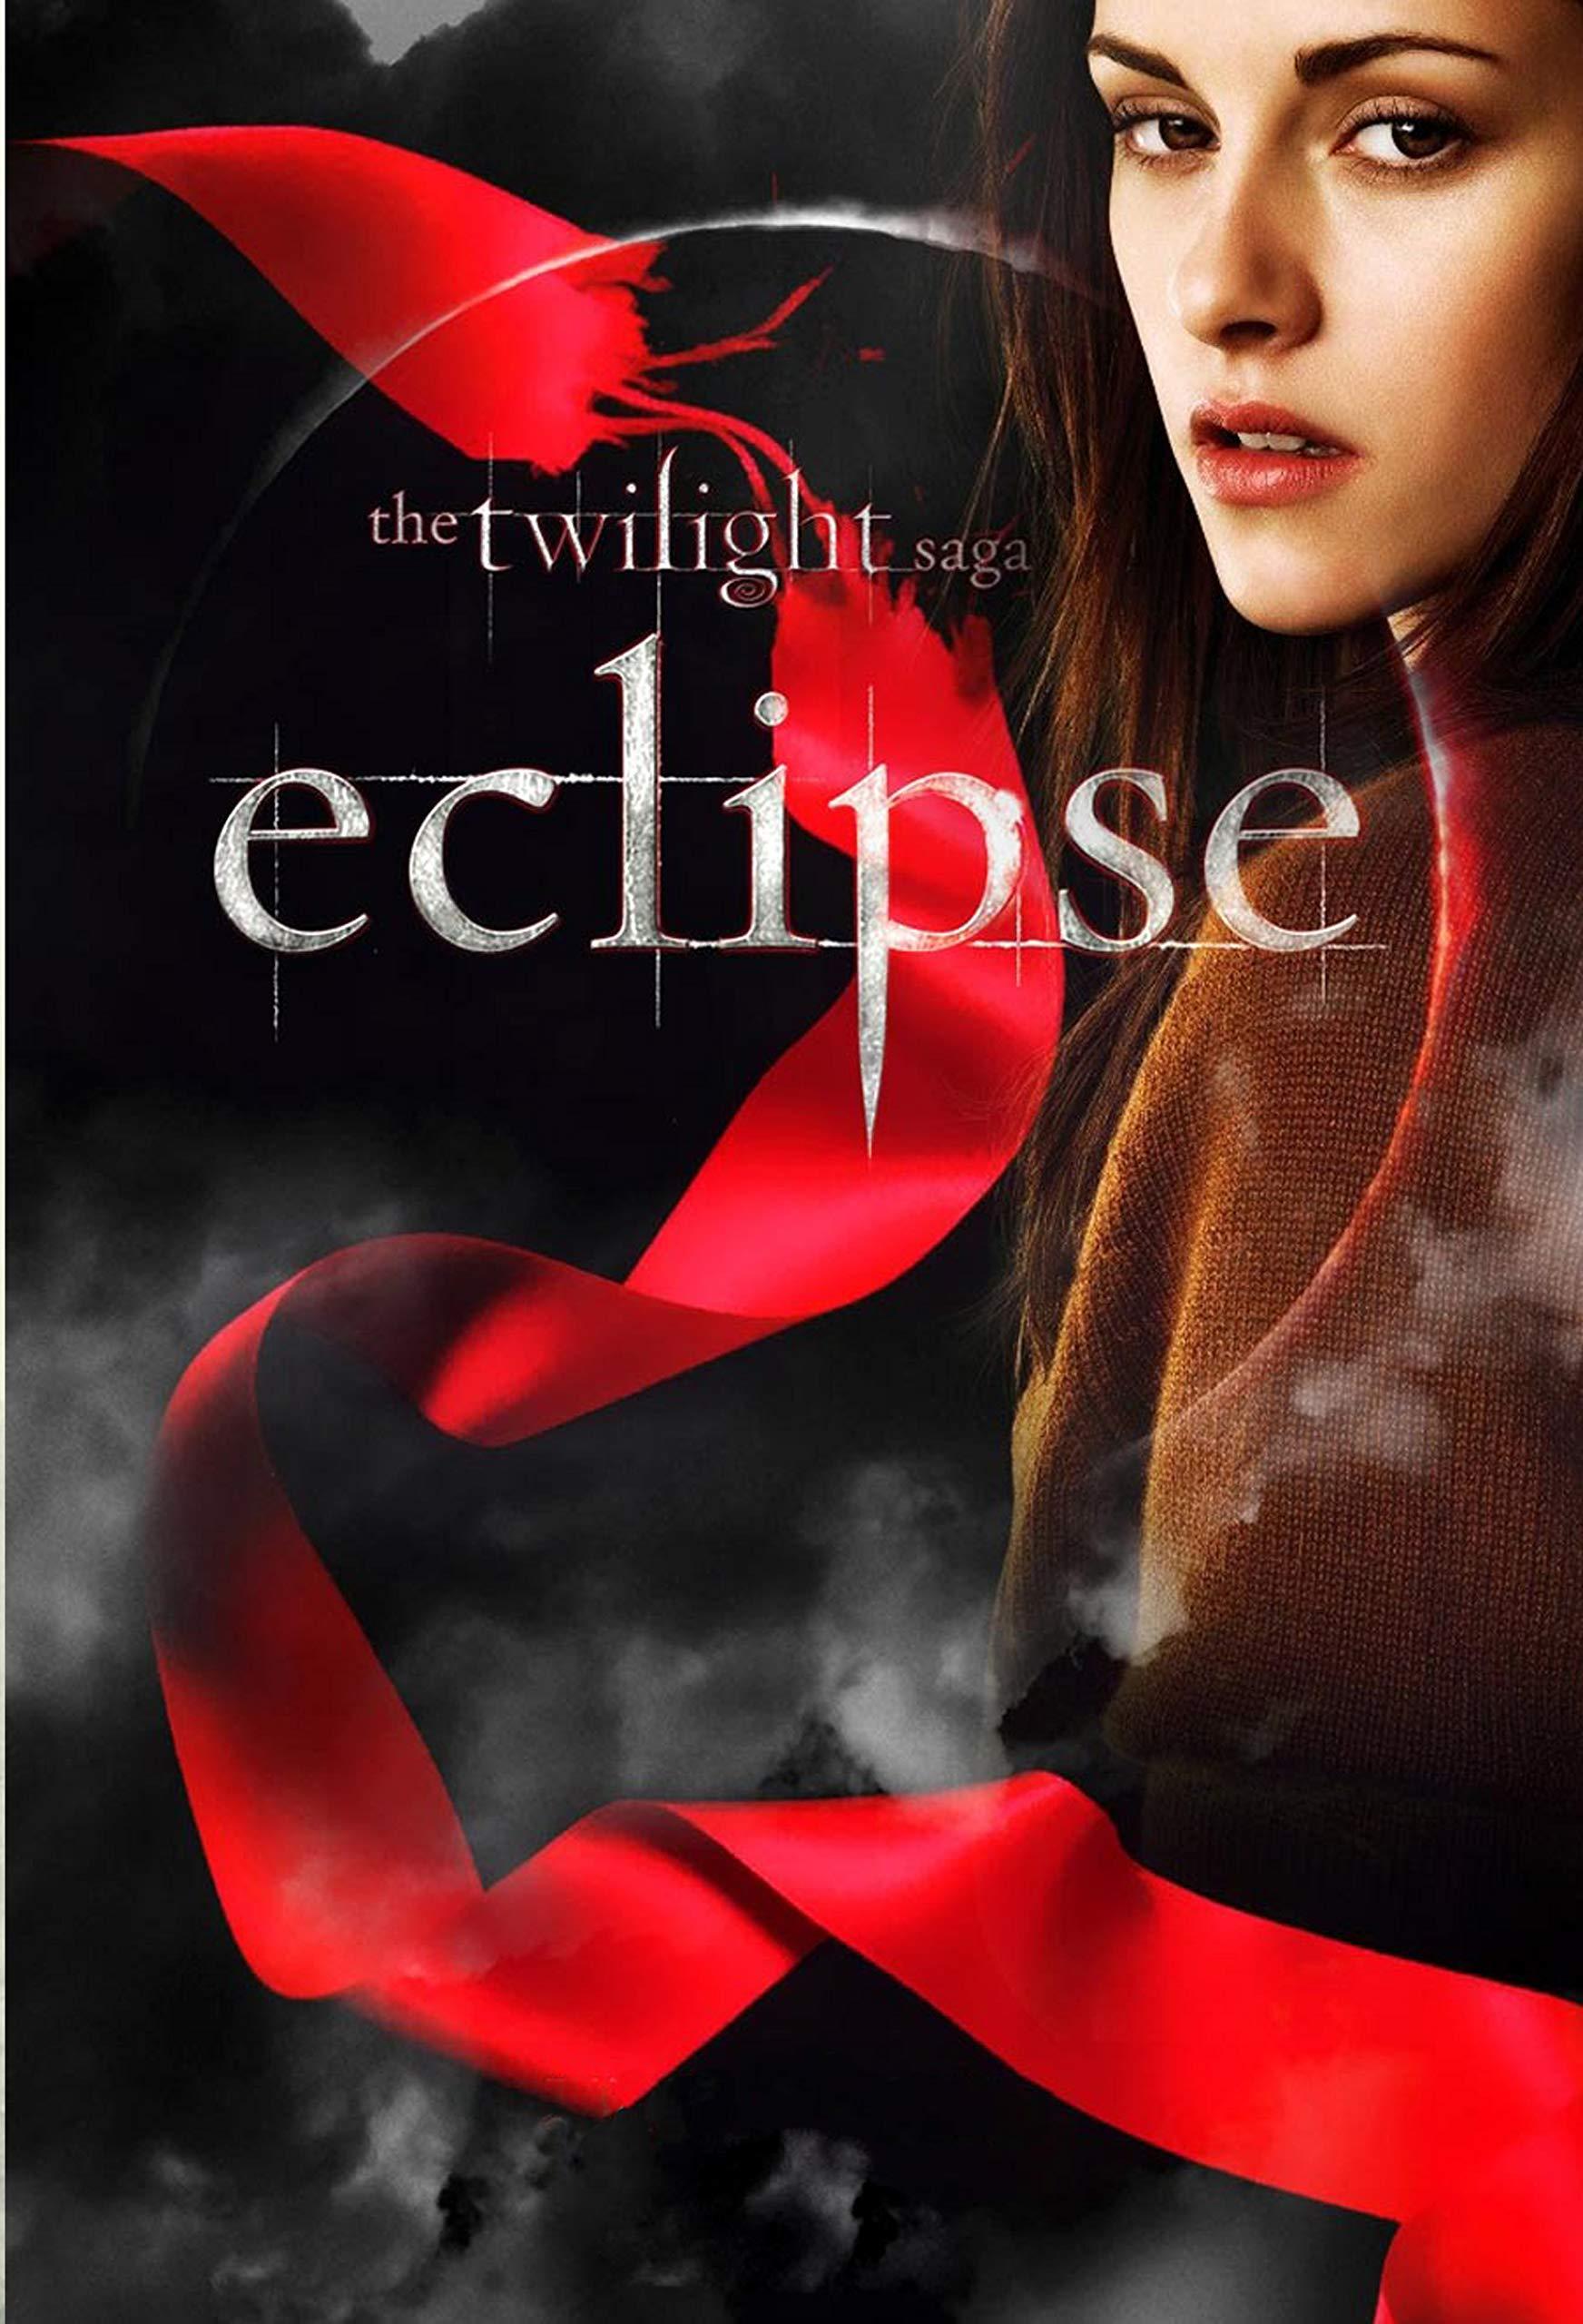 The Twilight Saga Eclipse : ScreenPlay